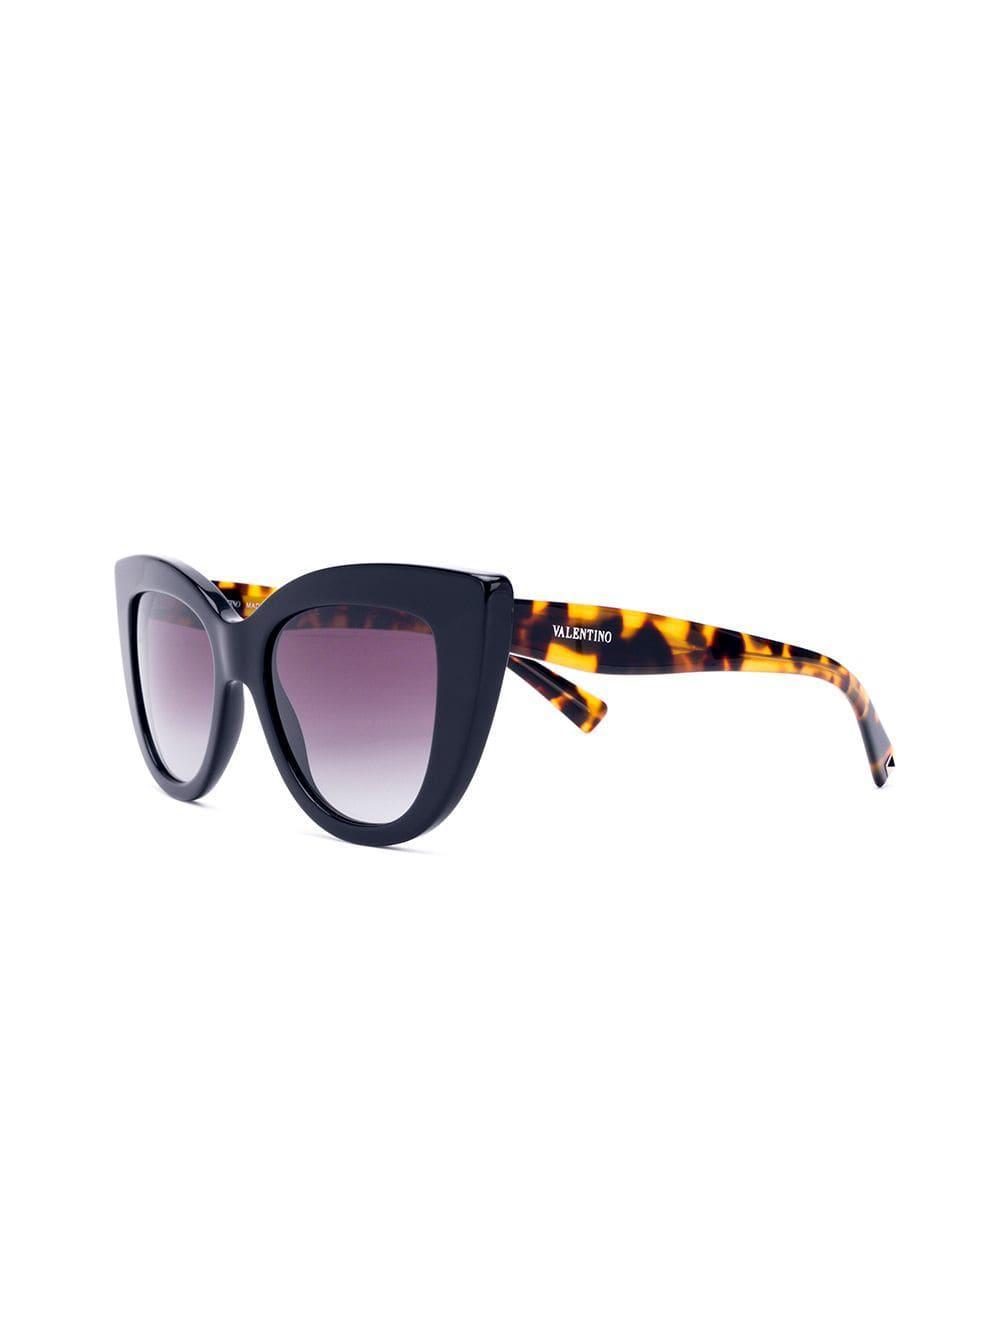 1b941905ad Lyst - Valentino Eyewear Cat Eye Sunglasses in Black